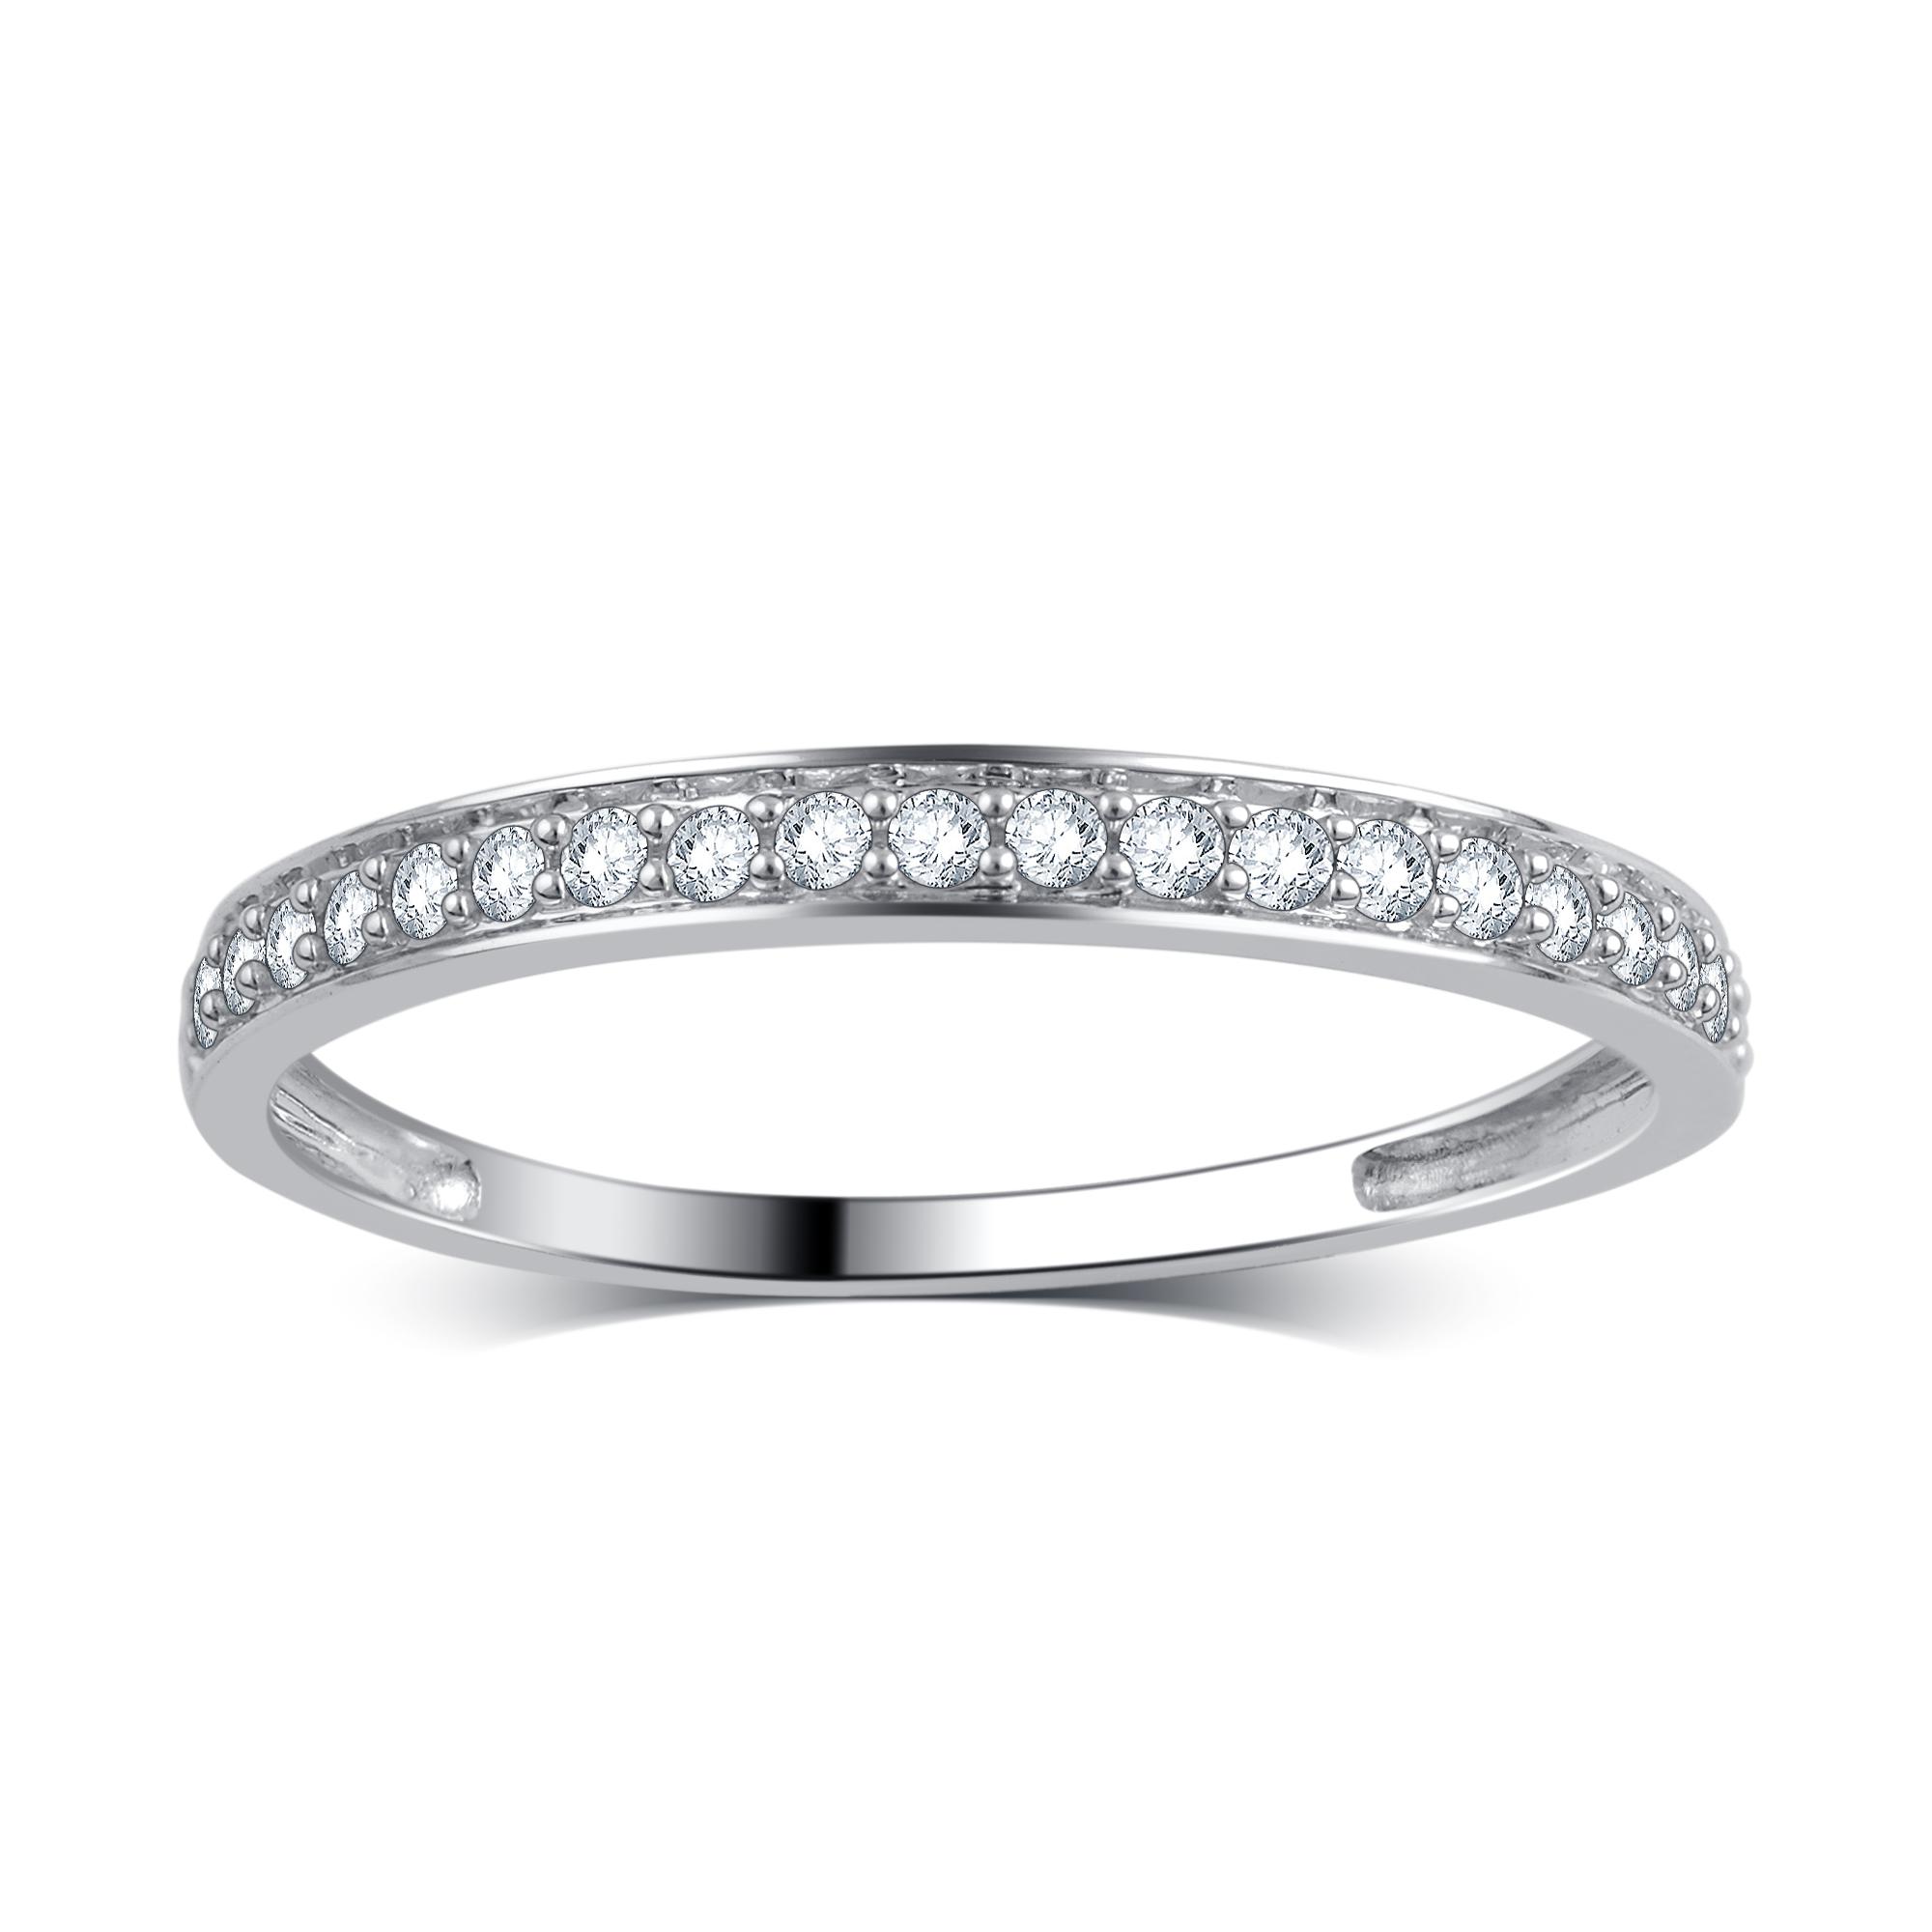 9ct Rosa /& Oro Blanco Diamante Anillo de boda banda de 4 mm